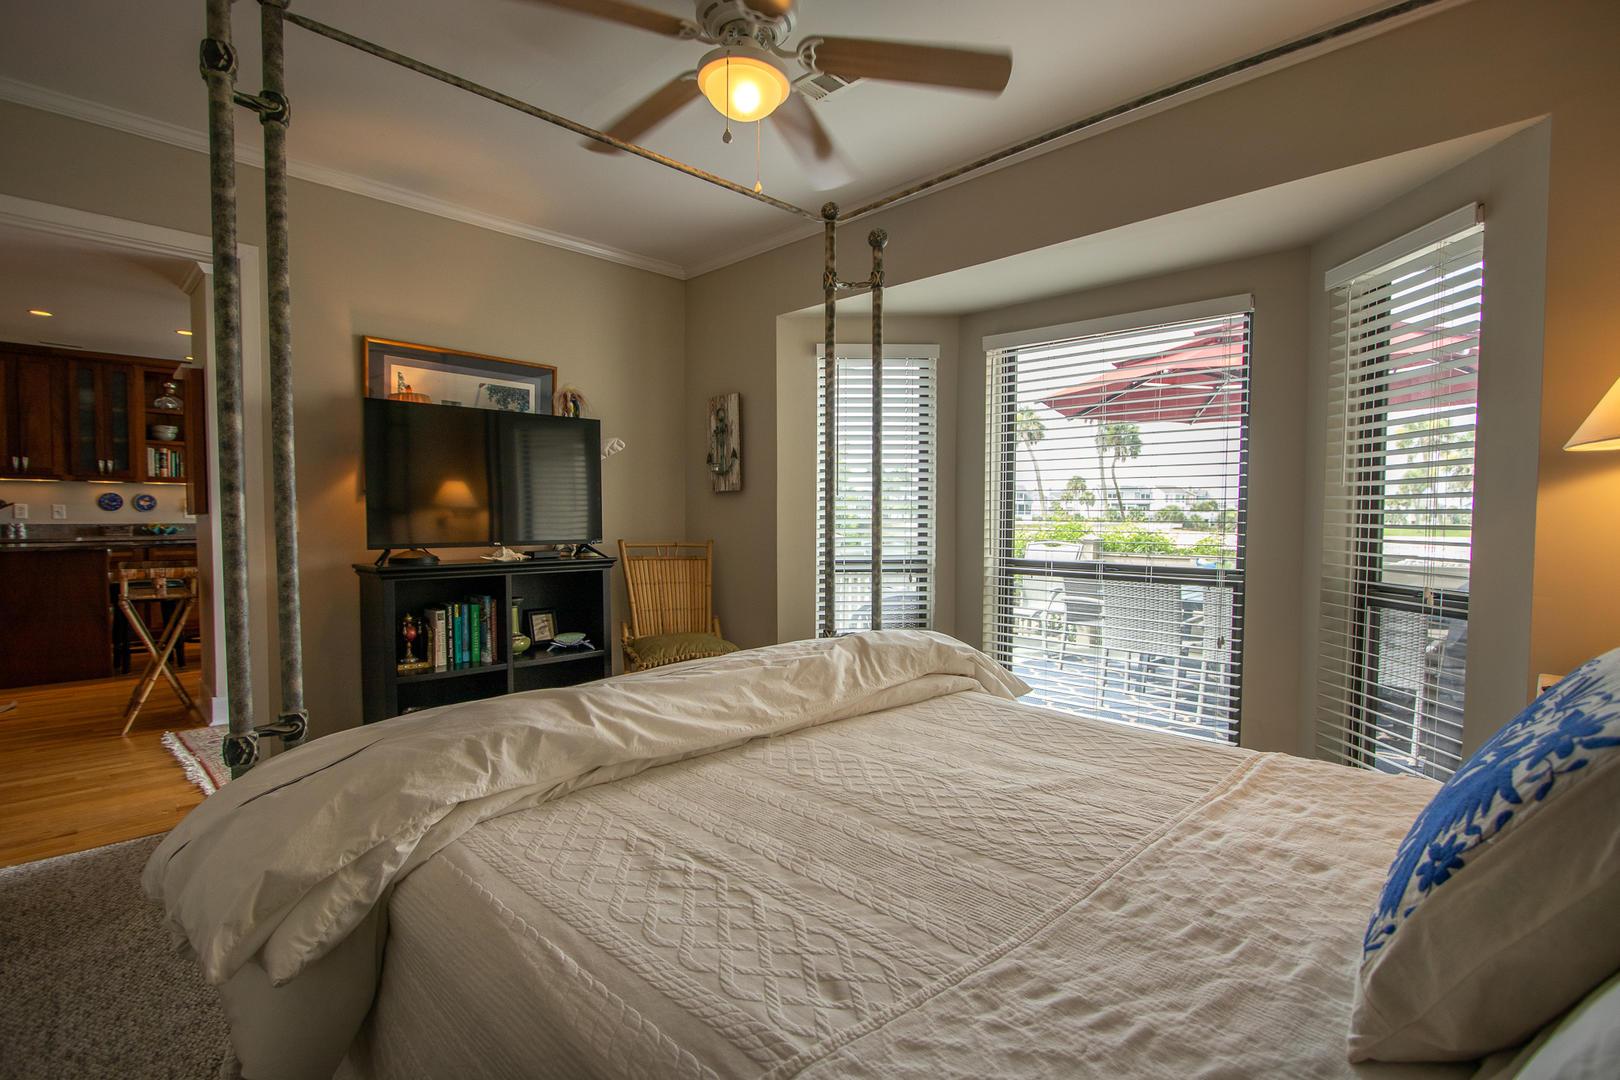 Bedroom 1, 1st floor, TV, jack and jill bath